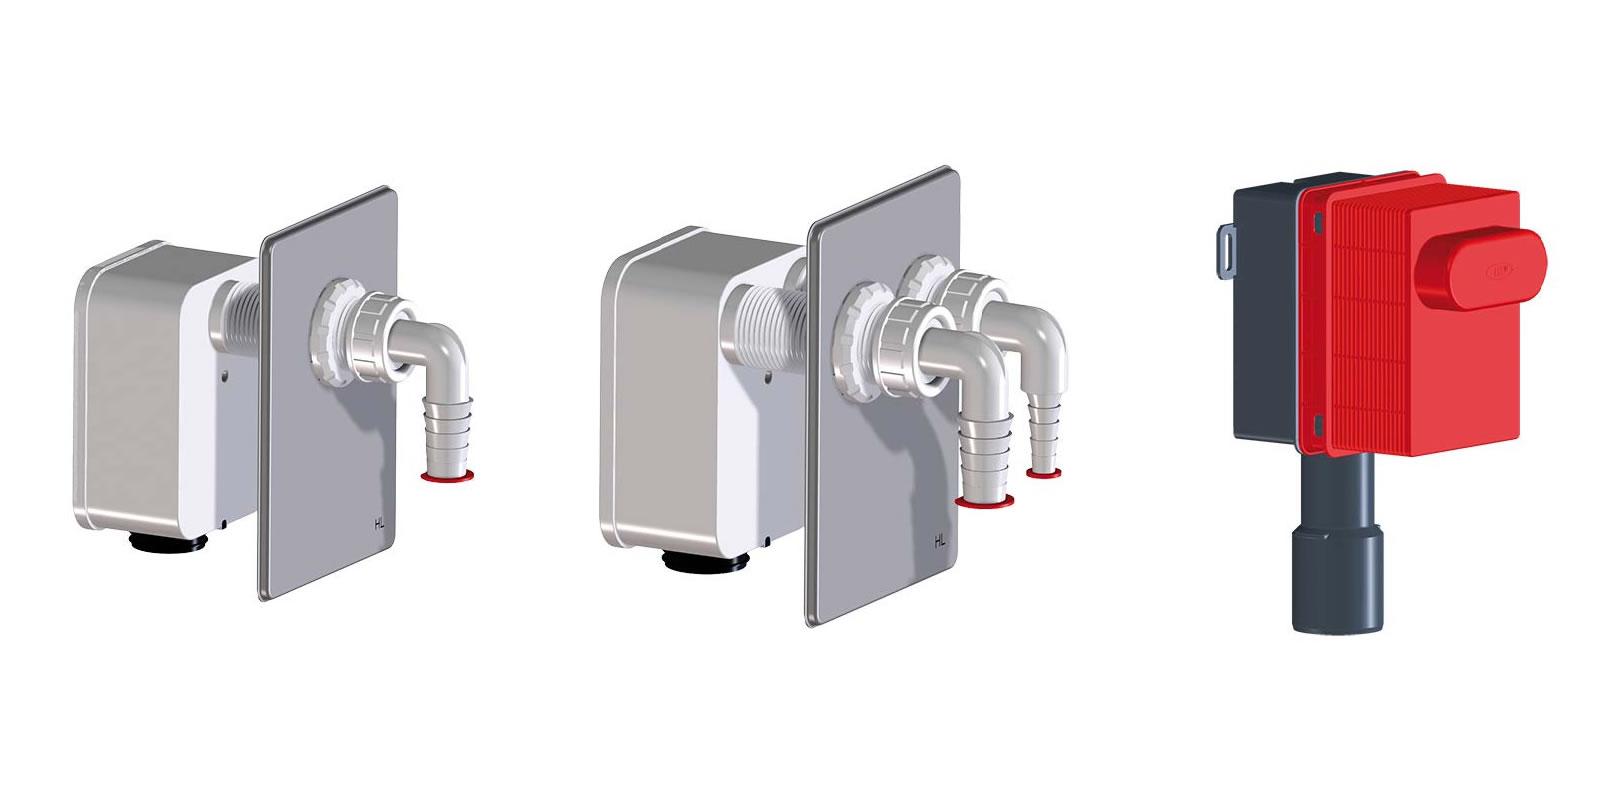 Univerzalni sifon HL 4000 za instalatere